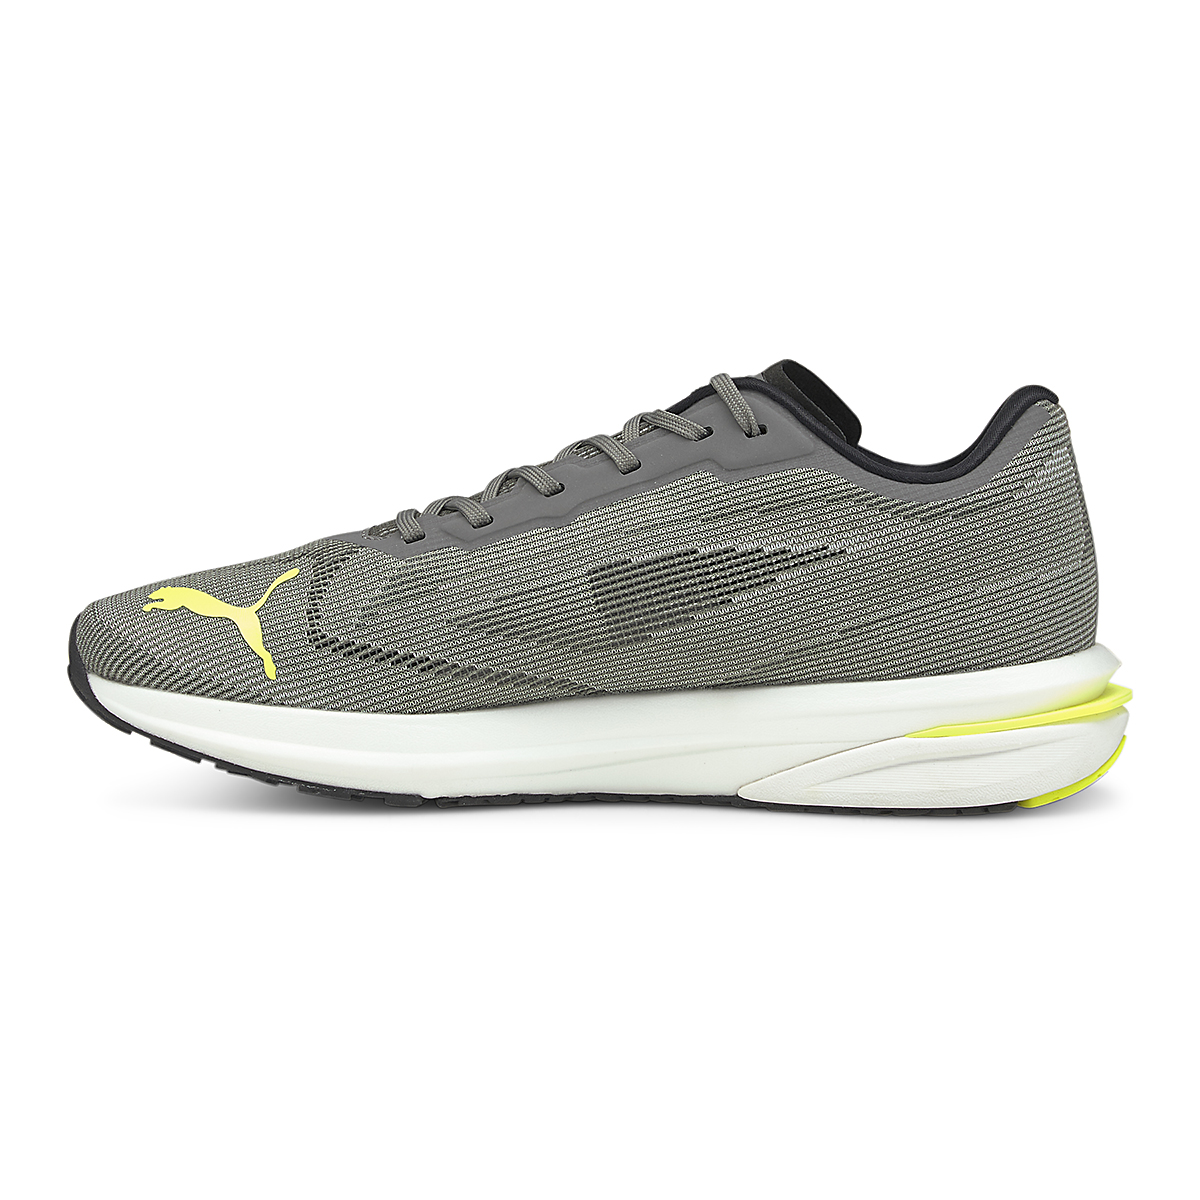 Men's Puma Velocity Nitro Running Shoe - Color: Castlerock-Yellow Alert-Puma Black - Size: 7 - Width: Regular, Castlerock-Yellow Alert-Puma Black, large, image 2